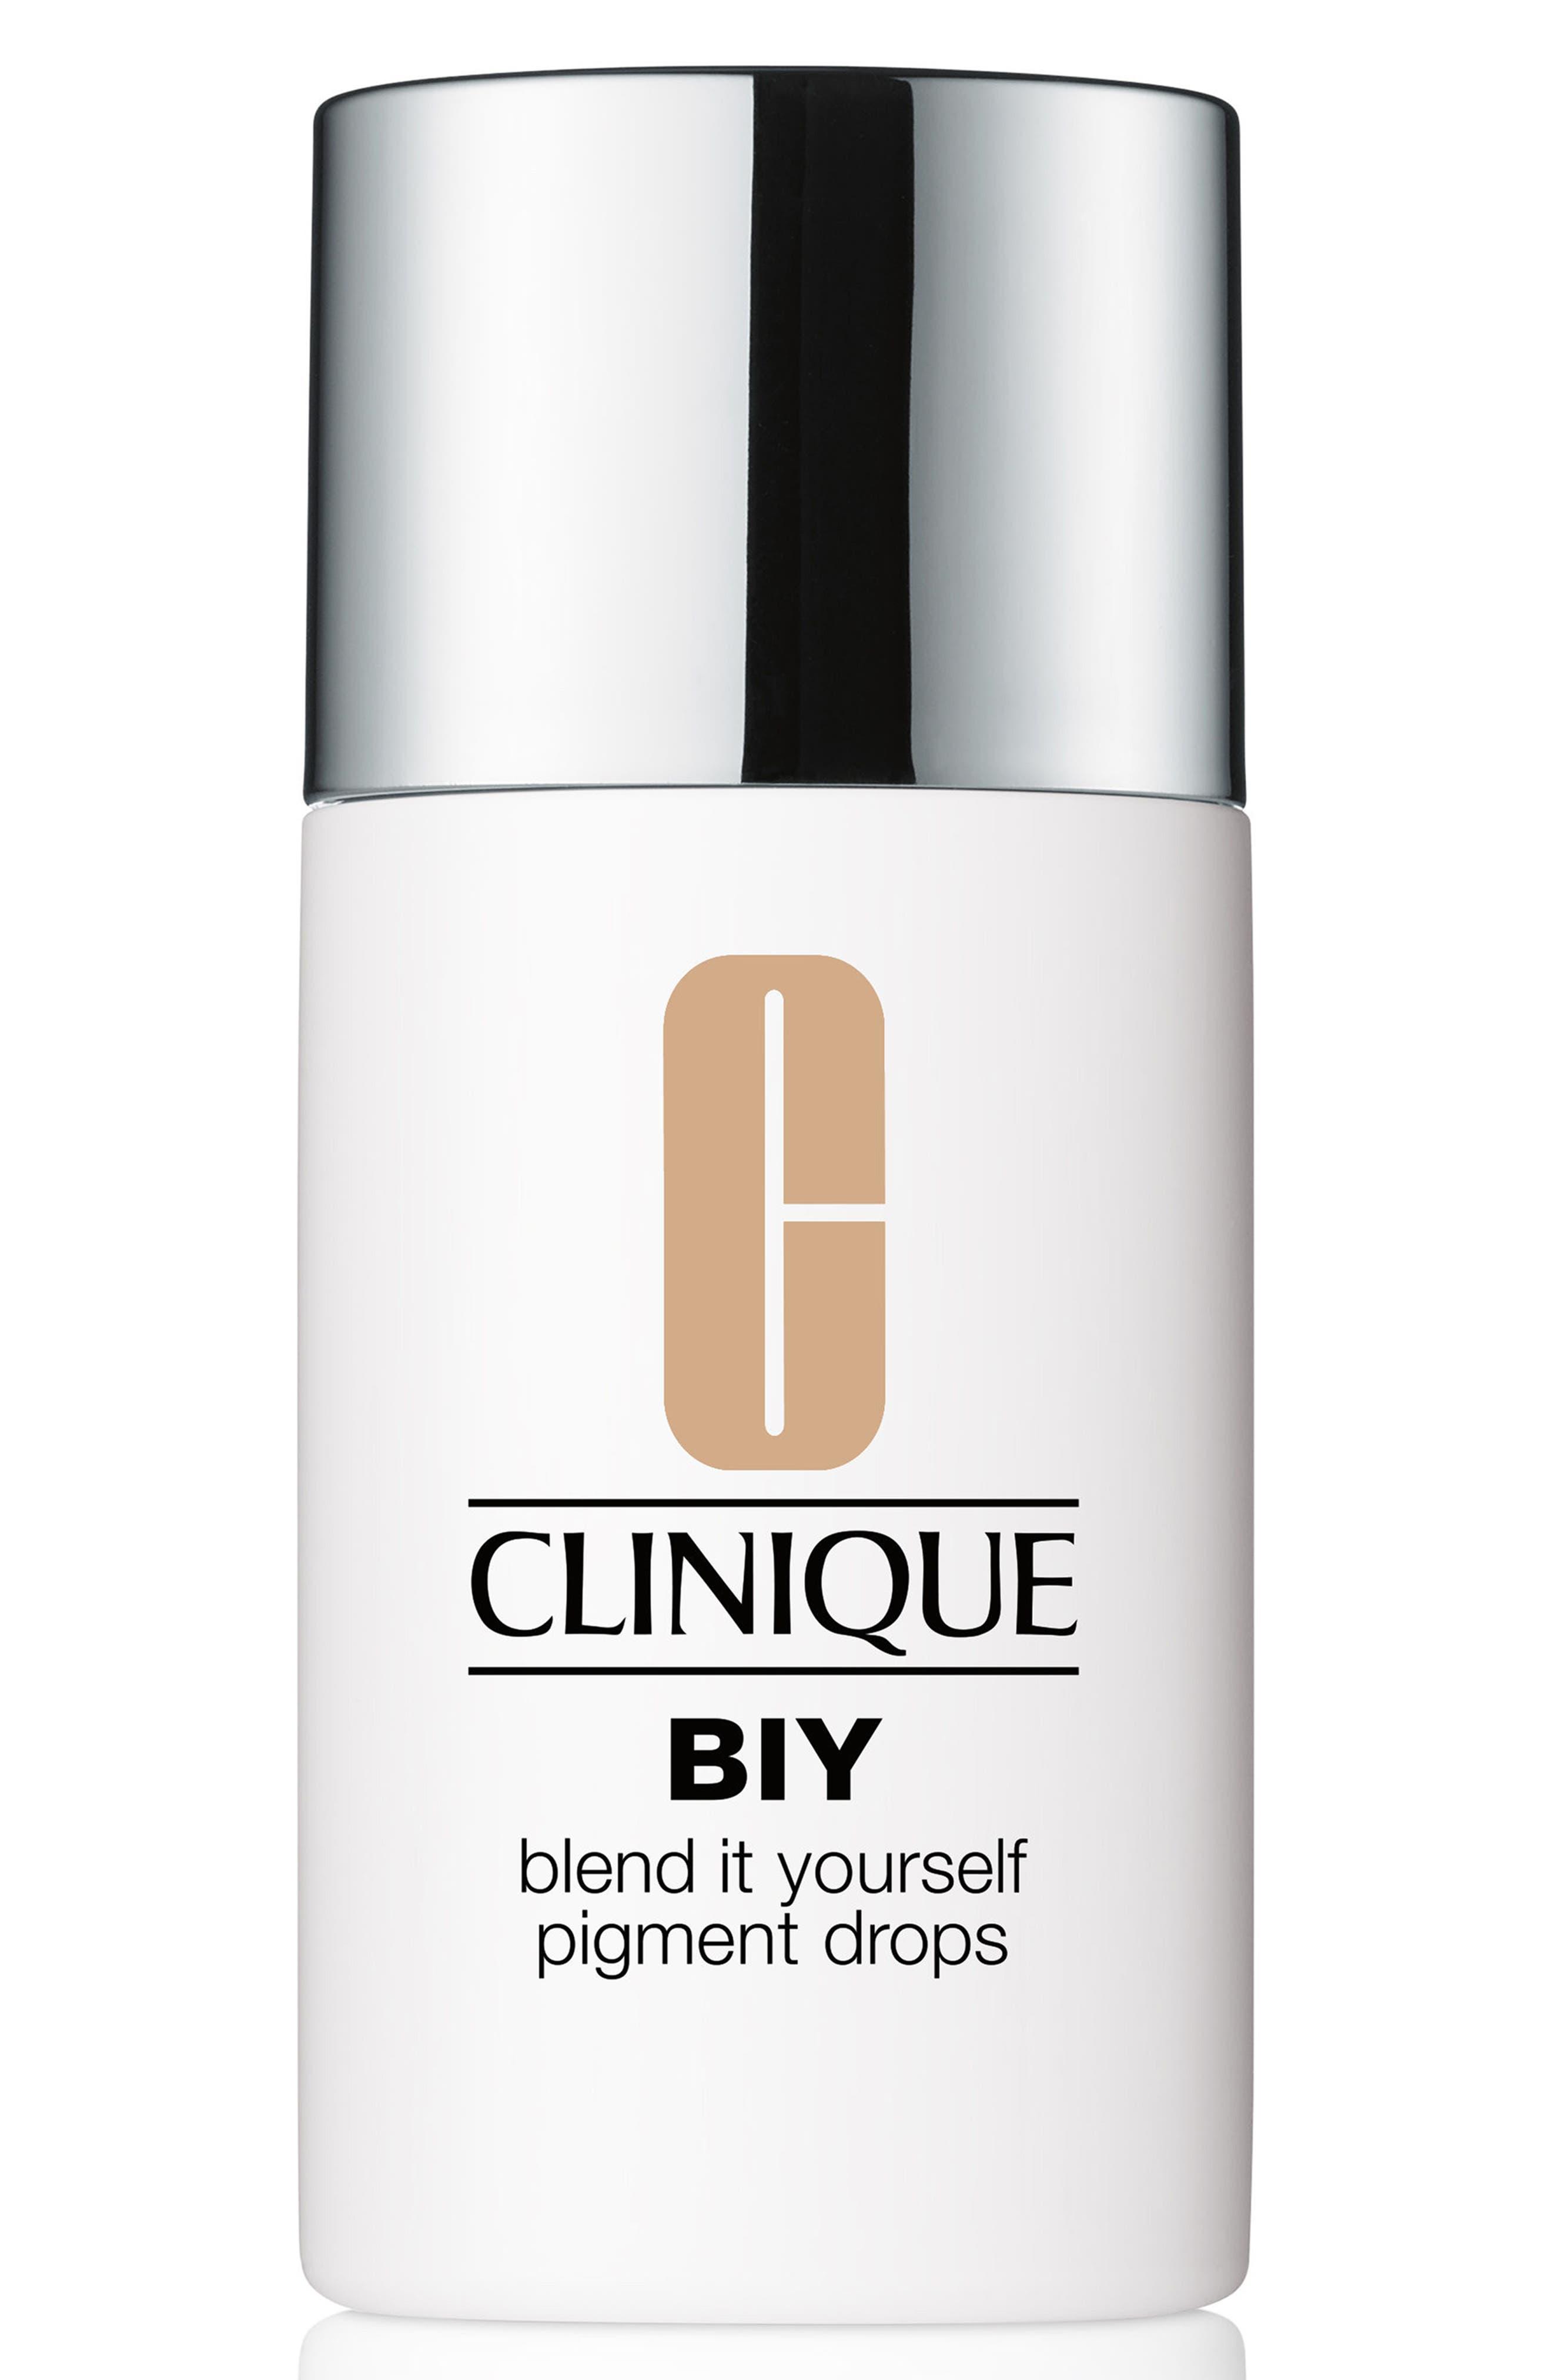 Main Image - Clinique BIY Blend It Yourself Pigment Drops